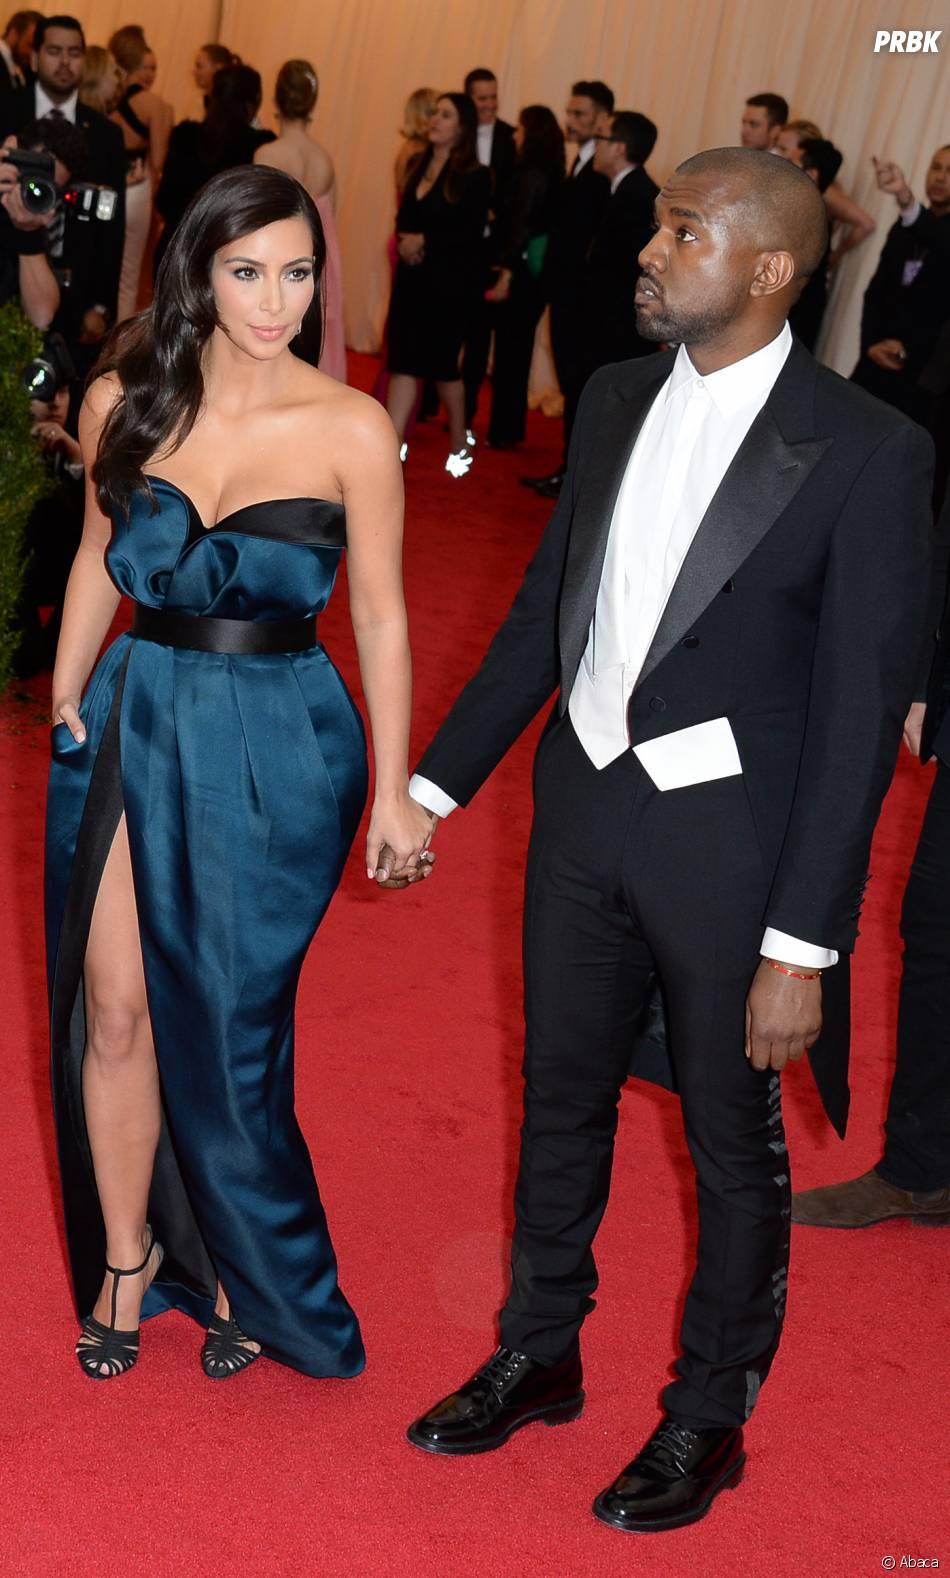 Kim Kardashian et Kanye West au MET Gala à New York le 5 mai 2014